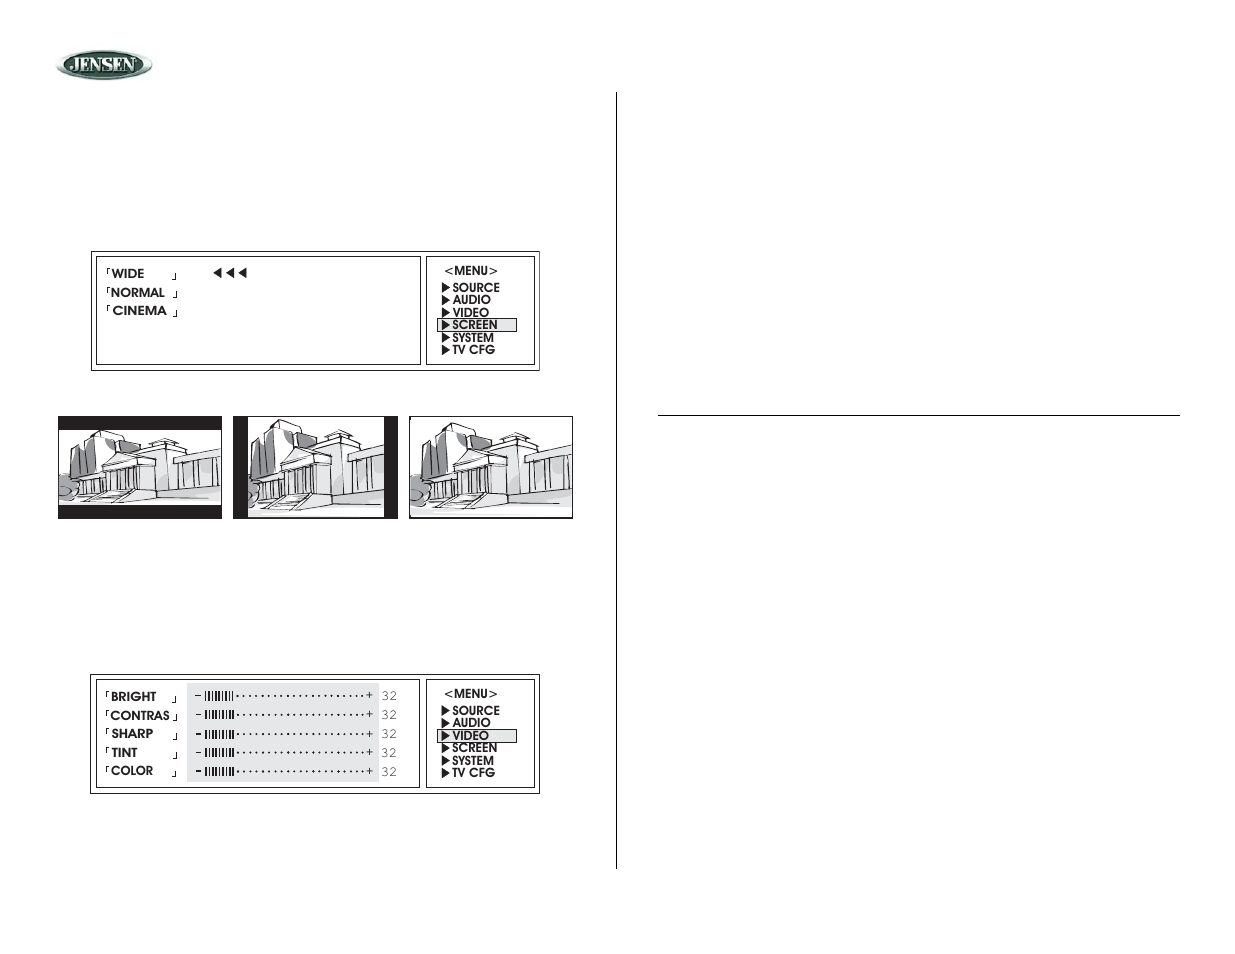 Jensen Vm9510 Wiring Diagram Schematics Stulz Aspect Electrical Diagrams Quadrafire